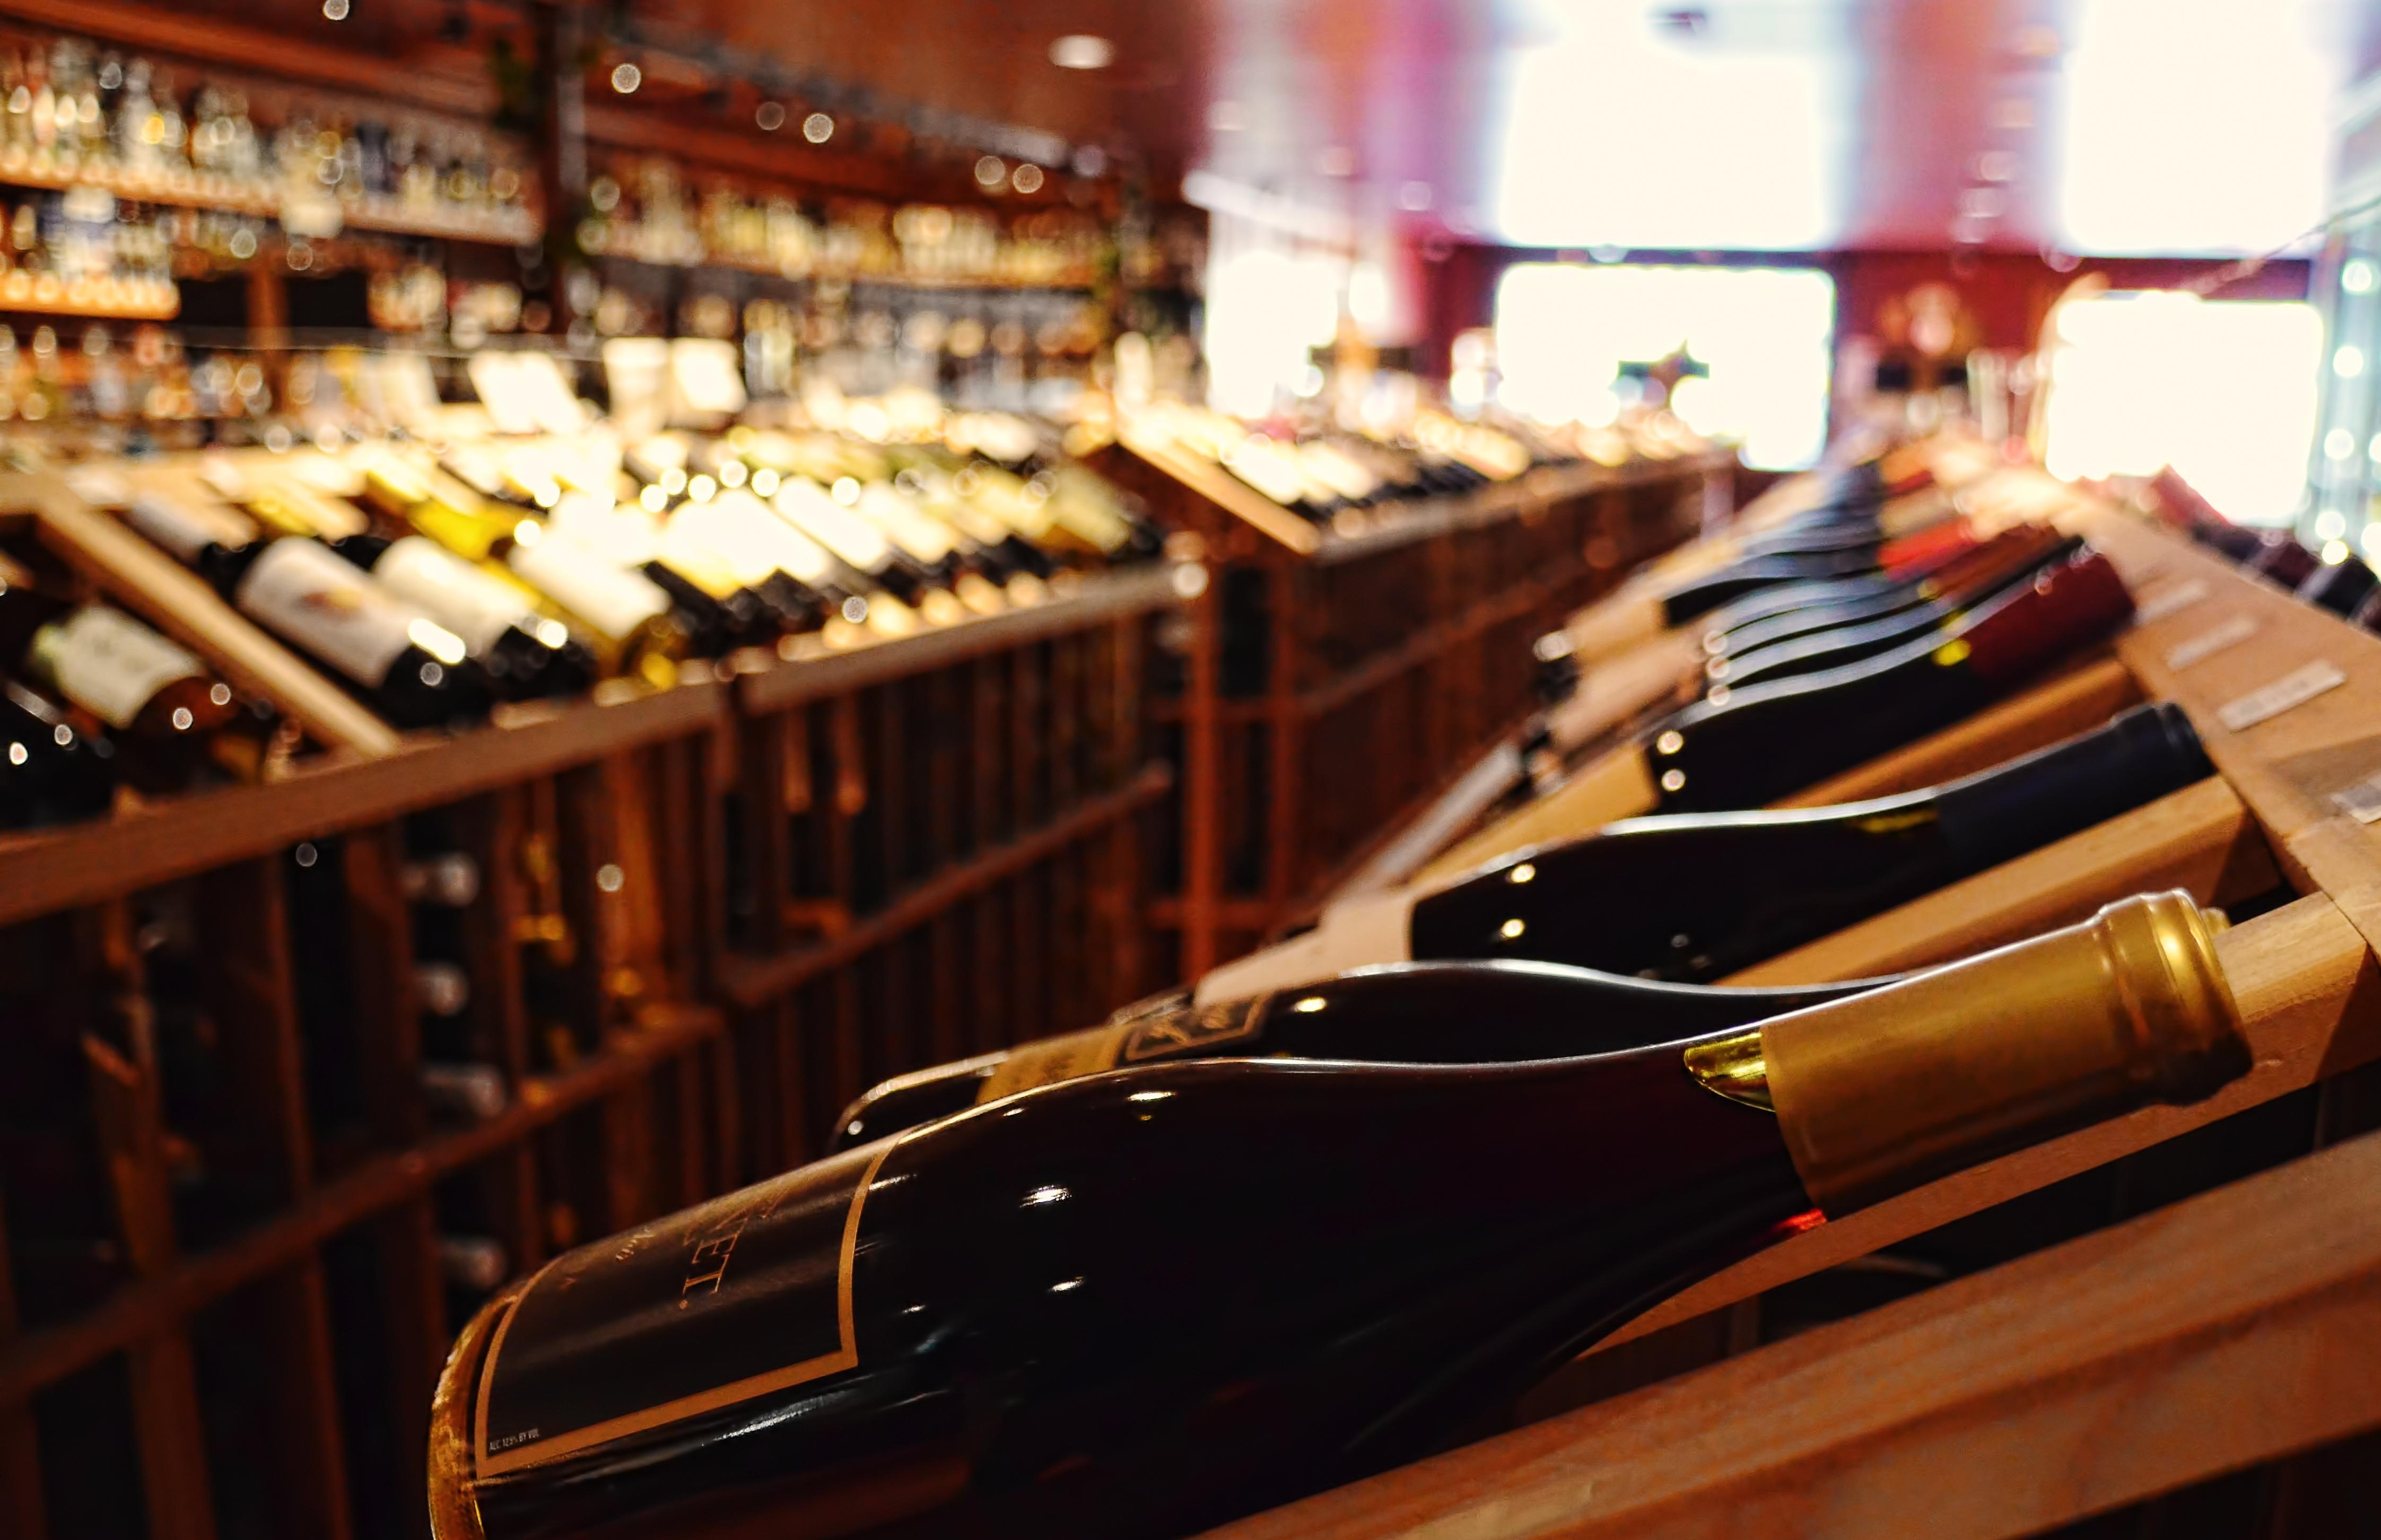 Wallpaper Liquor Store Drink Musical Instrument Accessory Wine 4489x2904 893673 Hd Wallpapers Wallhere